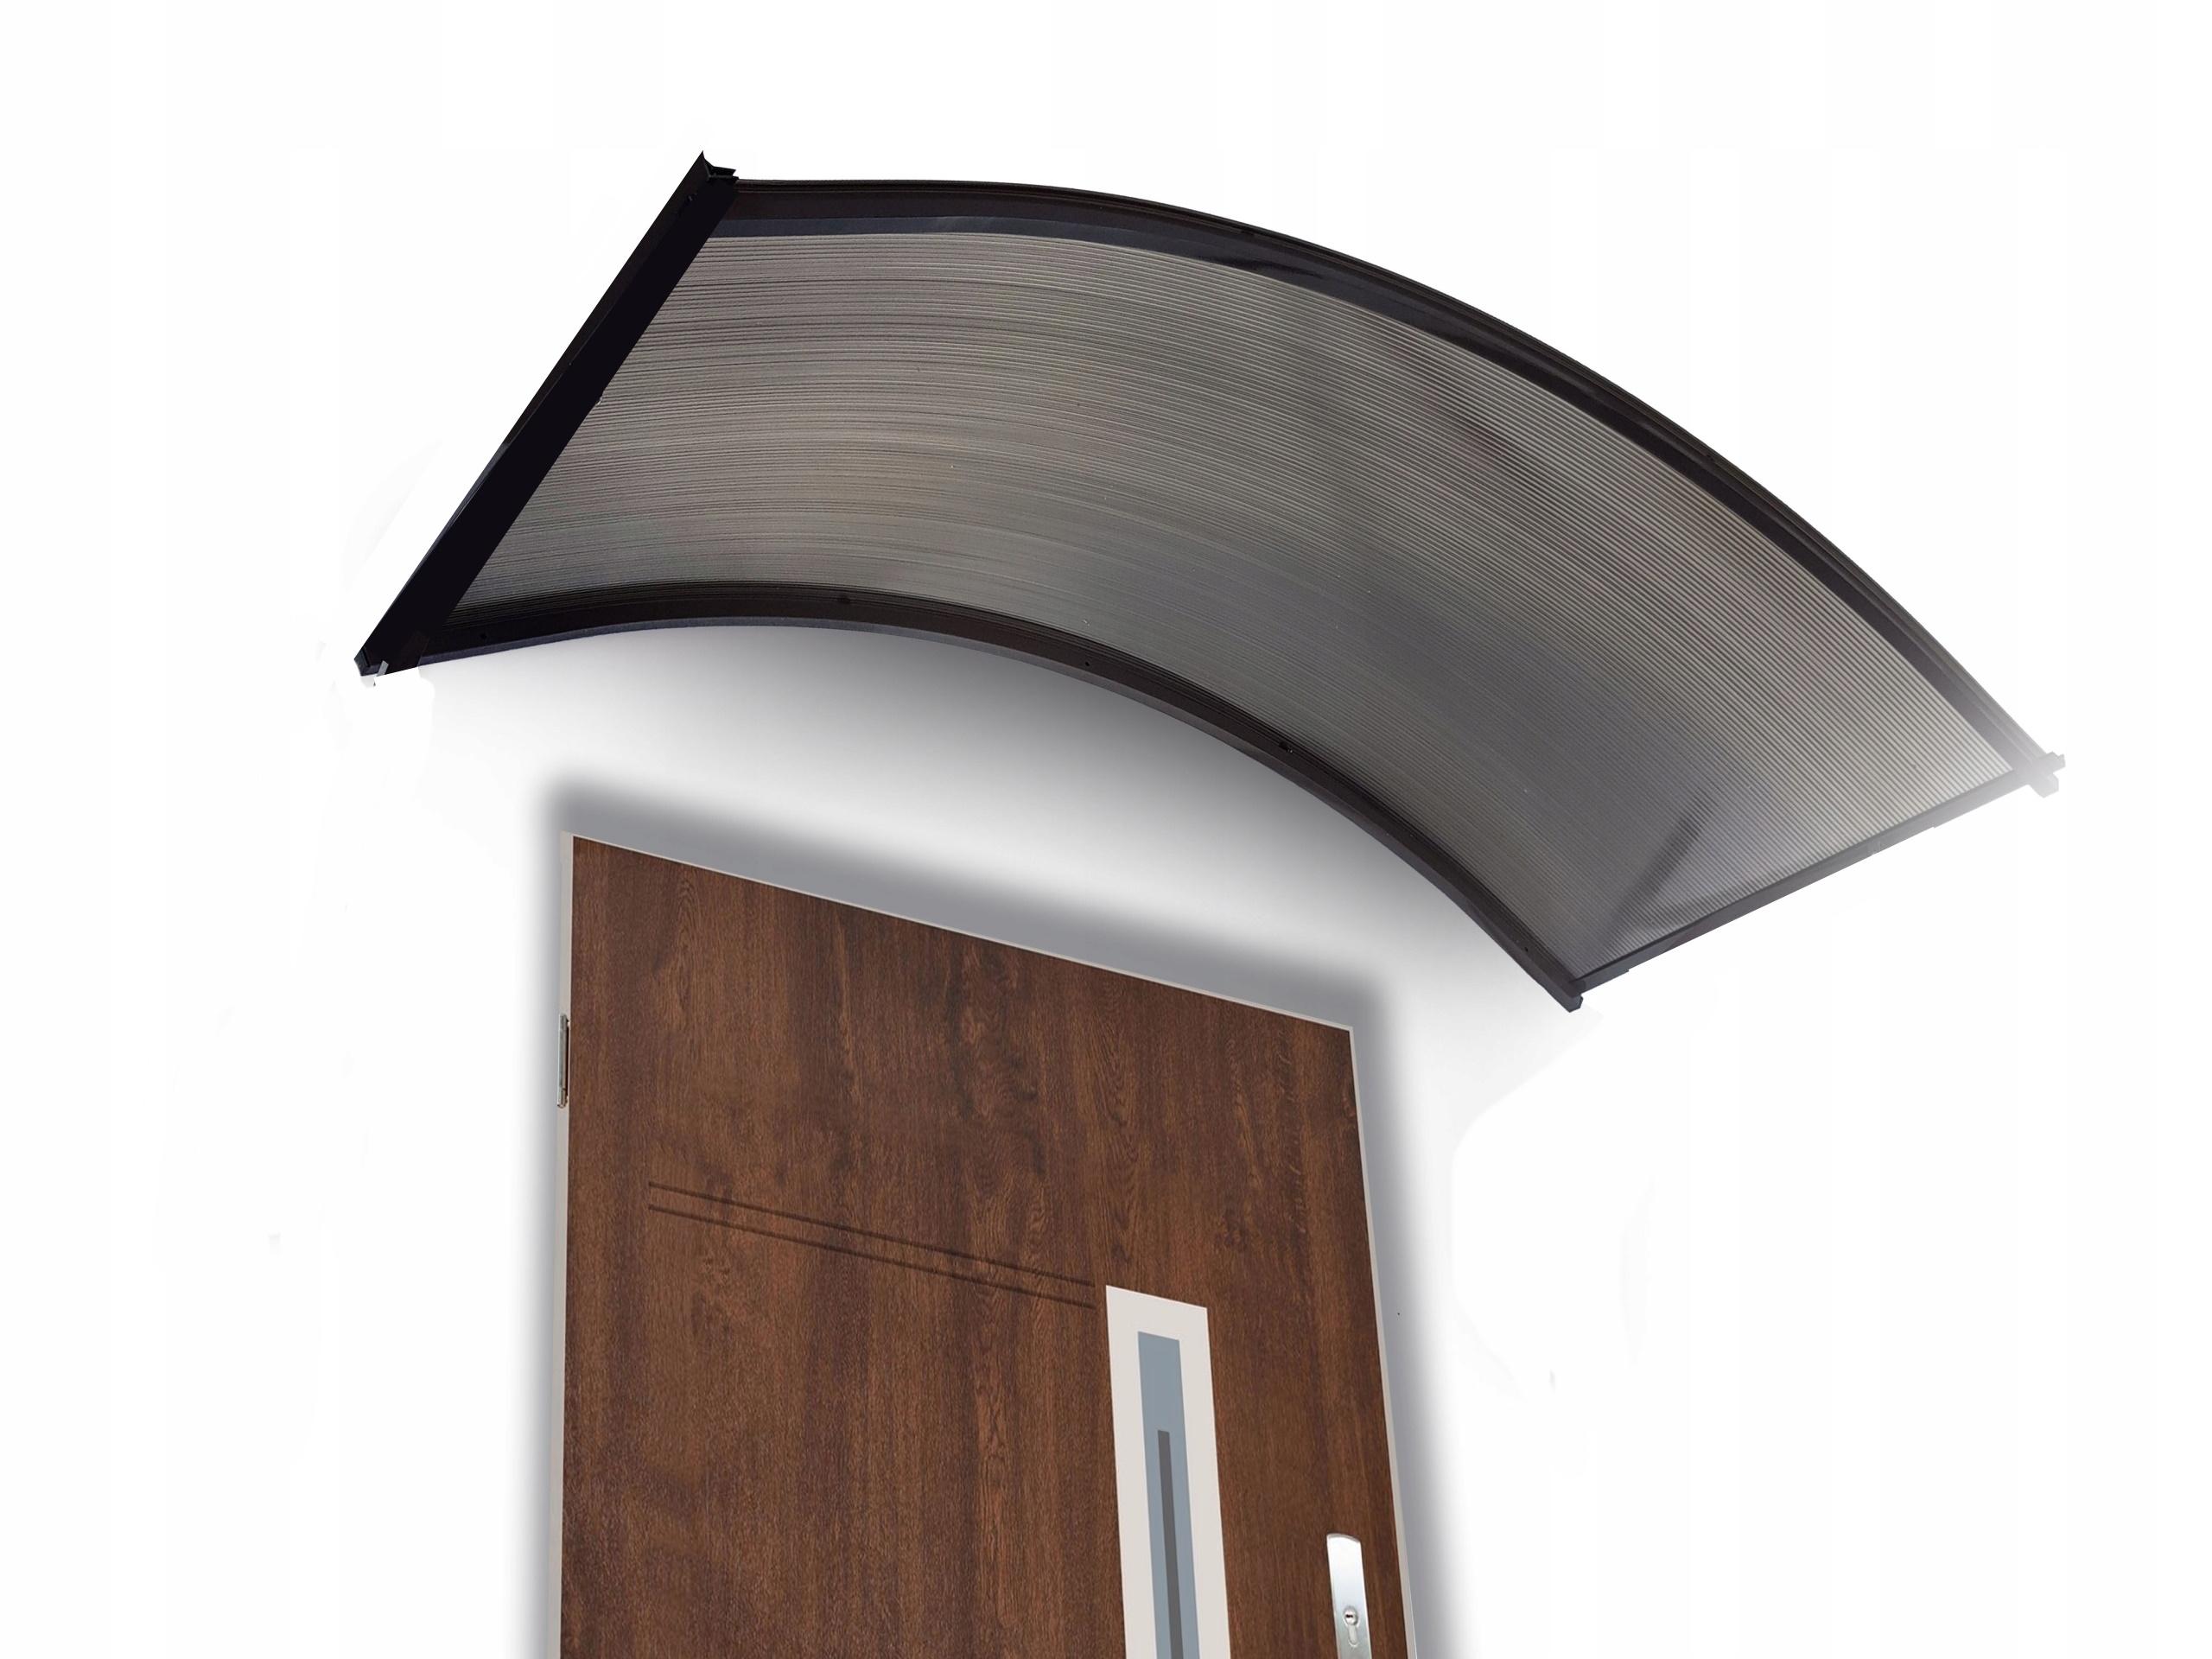 Strecha nad dvere, strecha 130x25x50, alu strechy